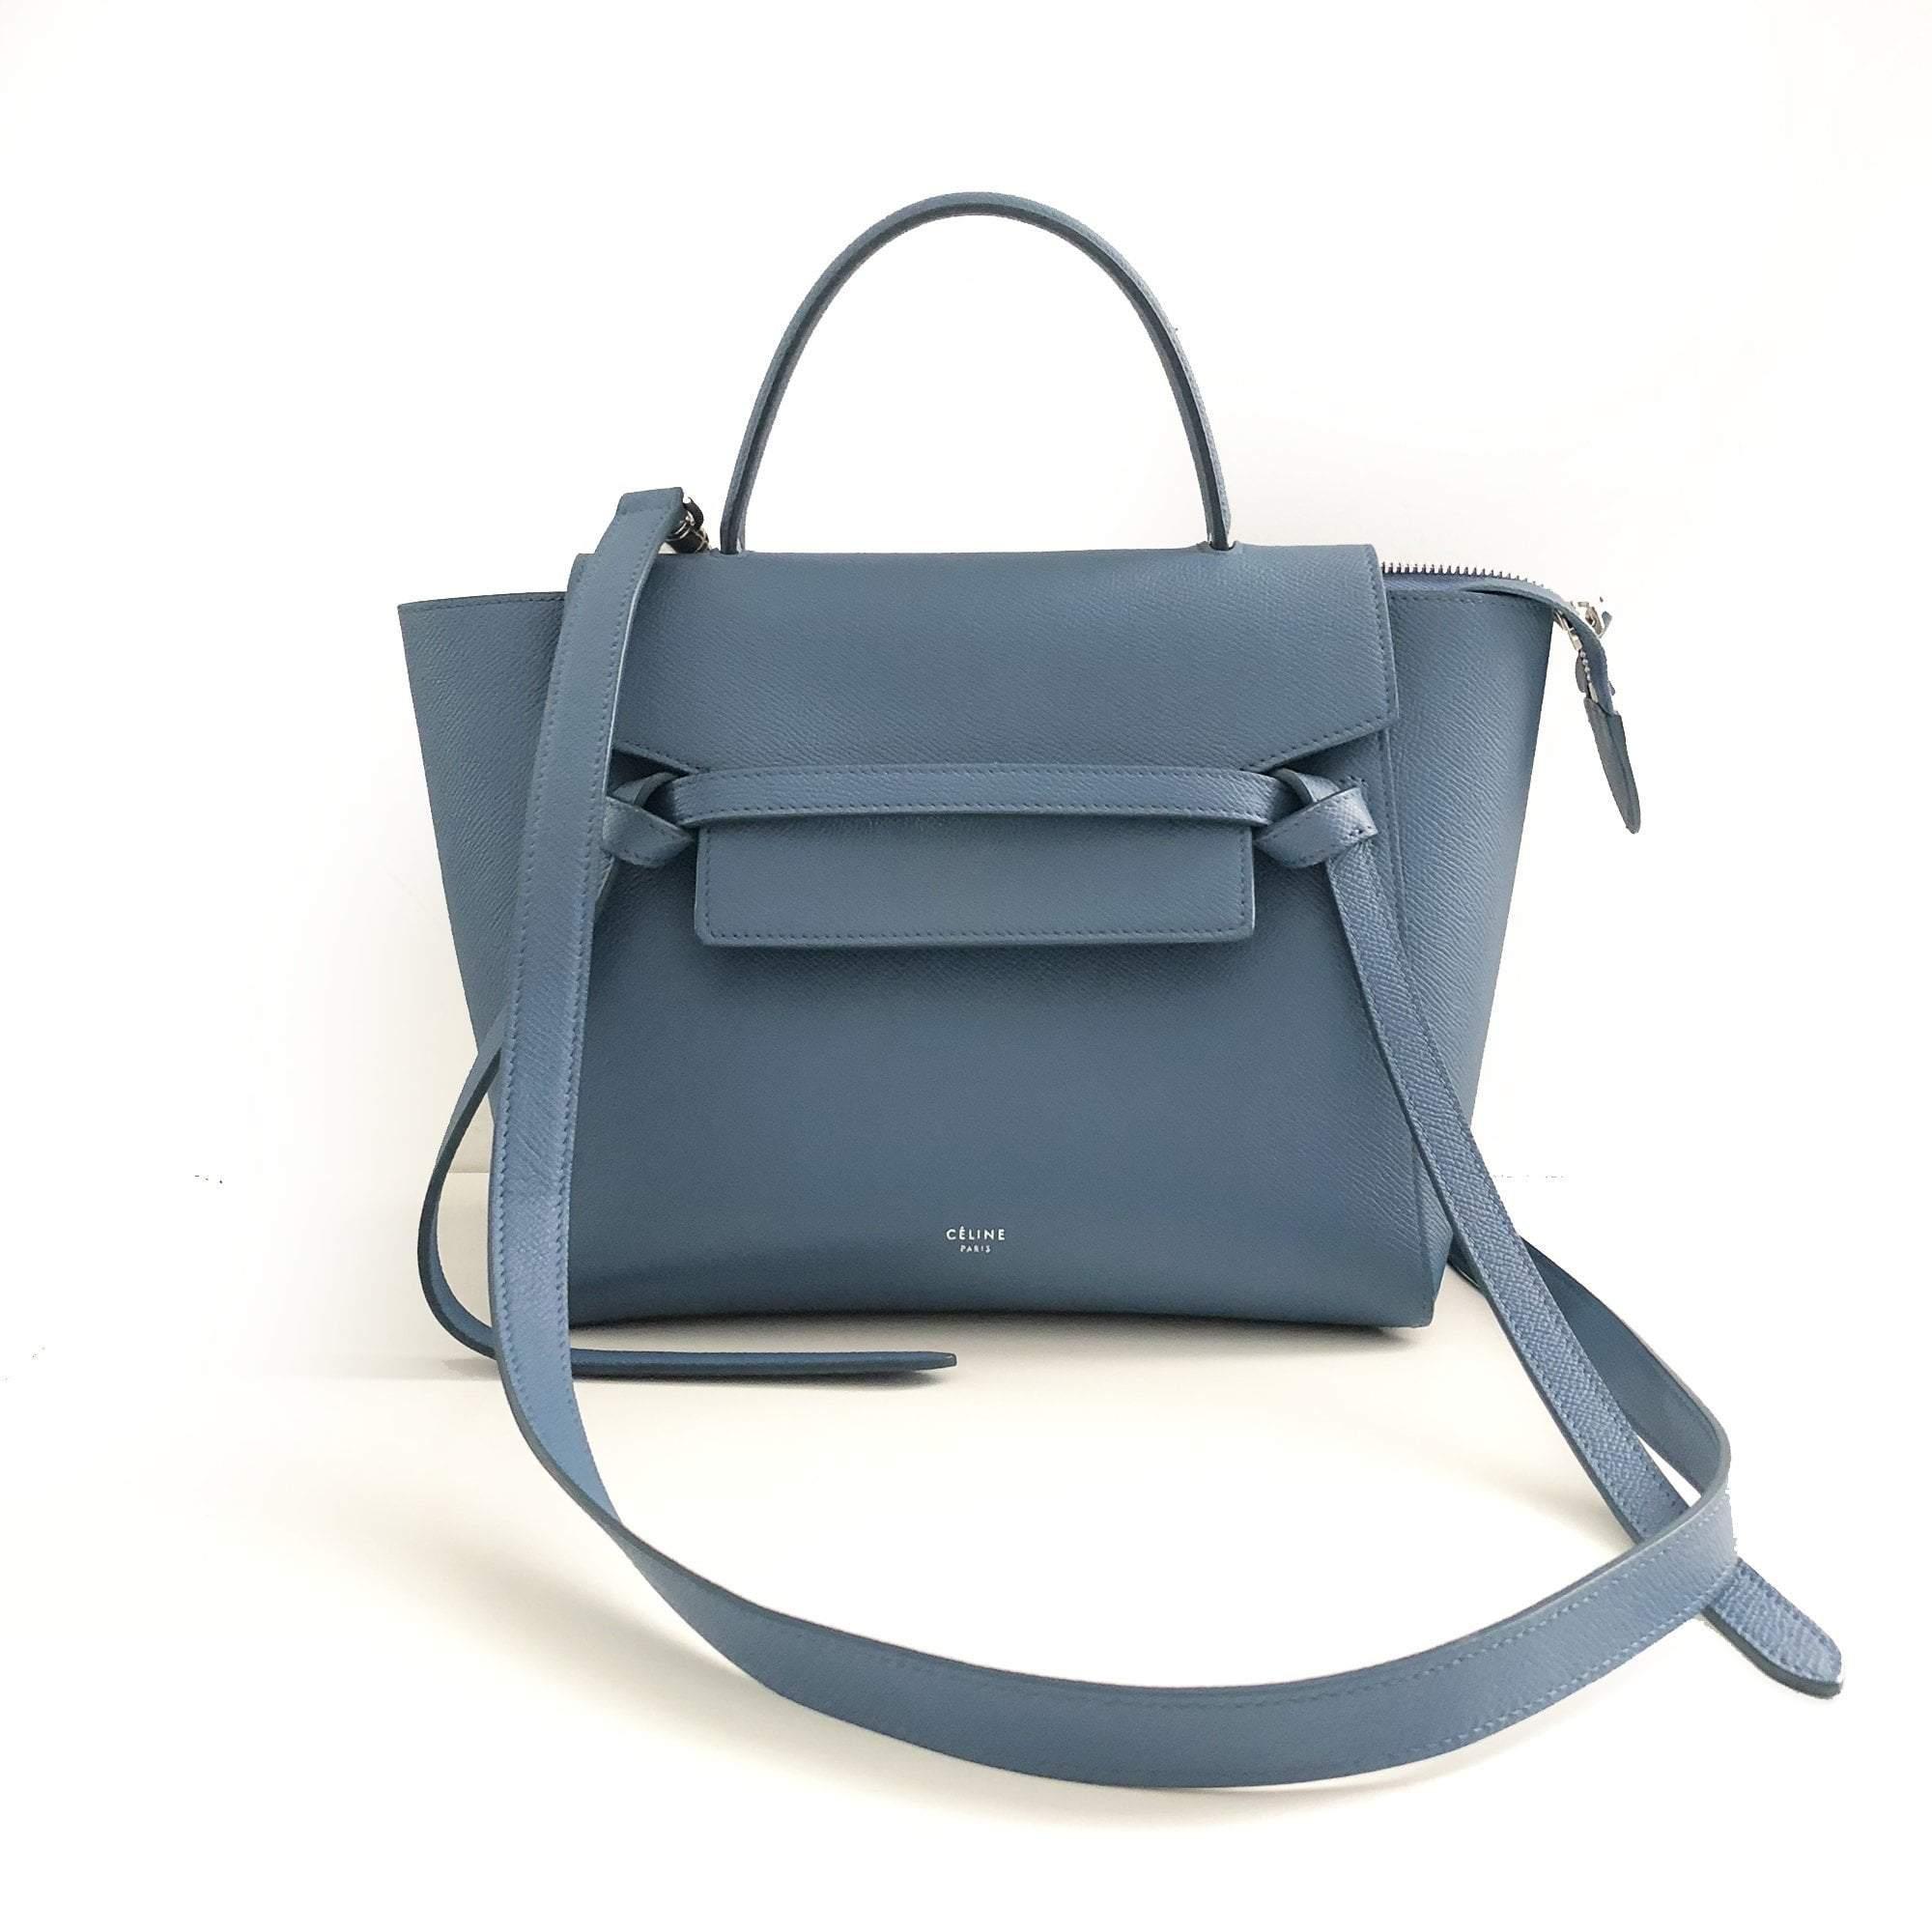 Celine Micro Belt Bag In Grained Calfskin – Garderobe